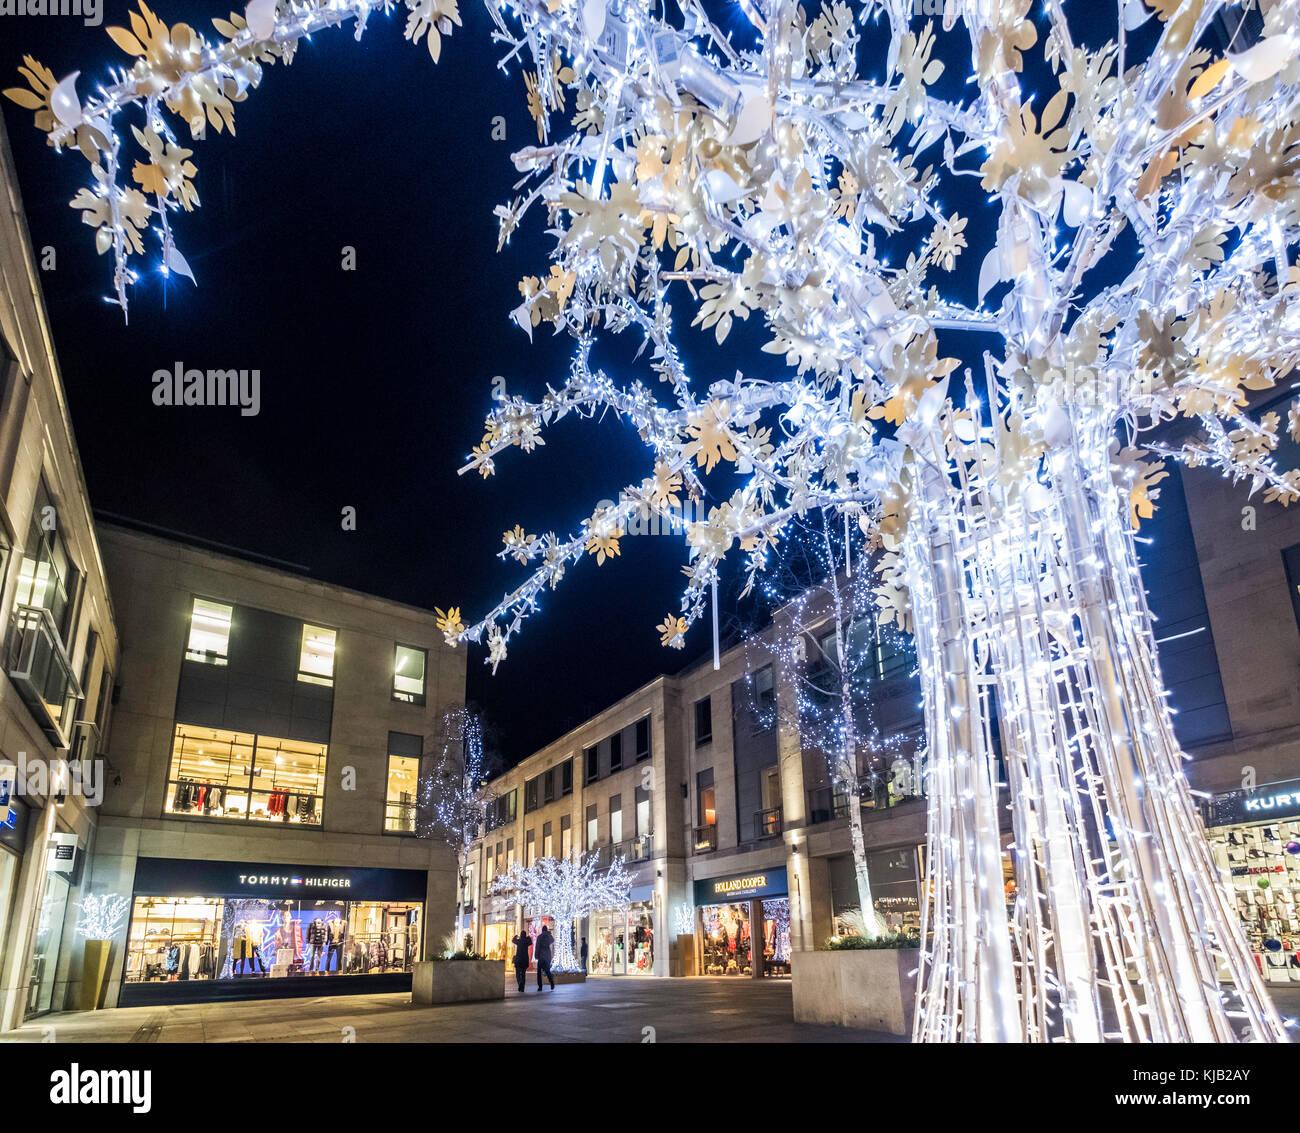 Light Shop In Edinburgh: Edinburgh At Night Stock Photos & Edinburgh At Night Stock